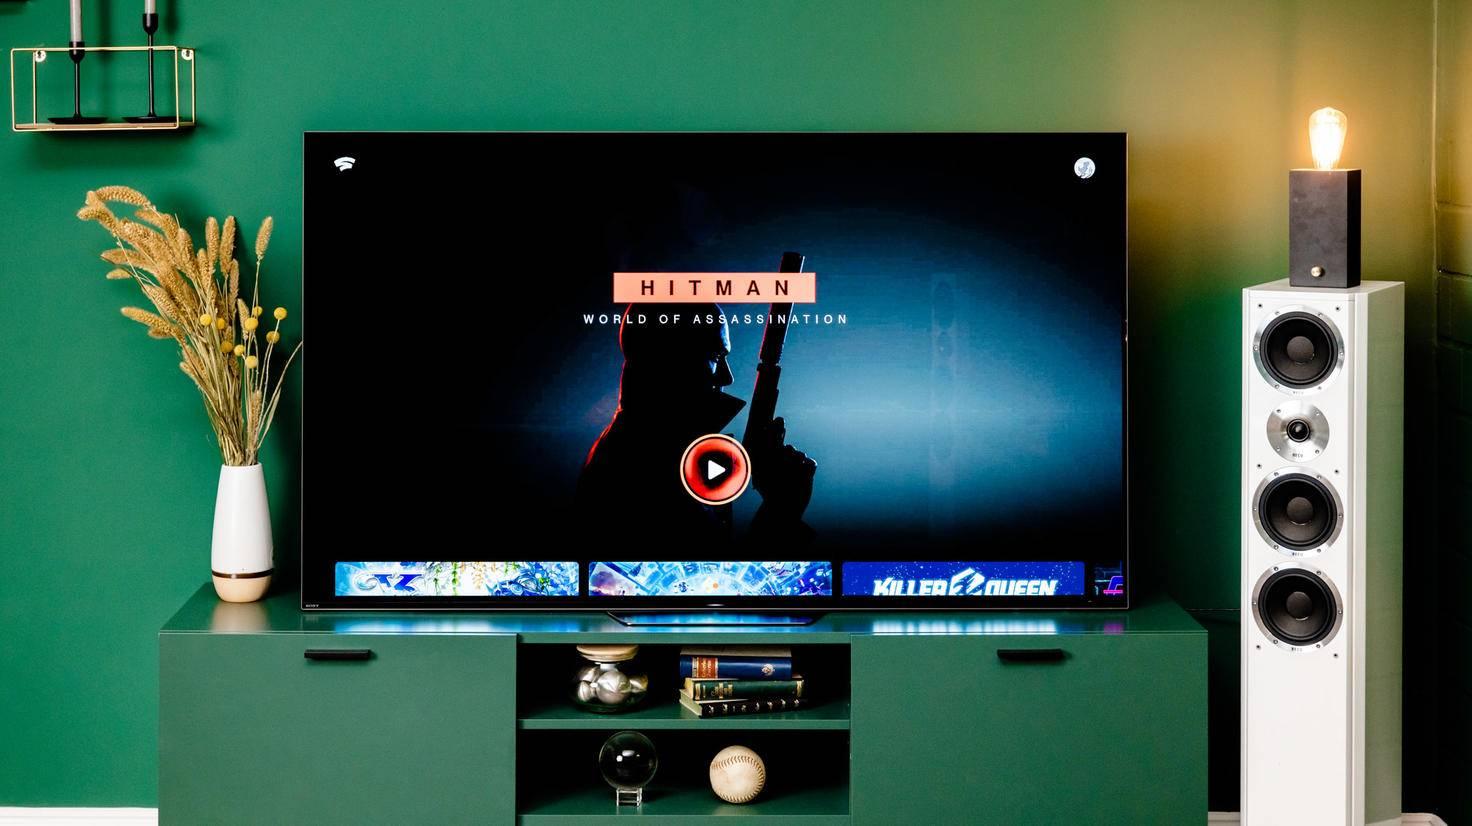 google-chromecast-mit-google-tv-stadia